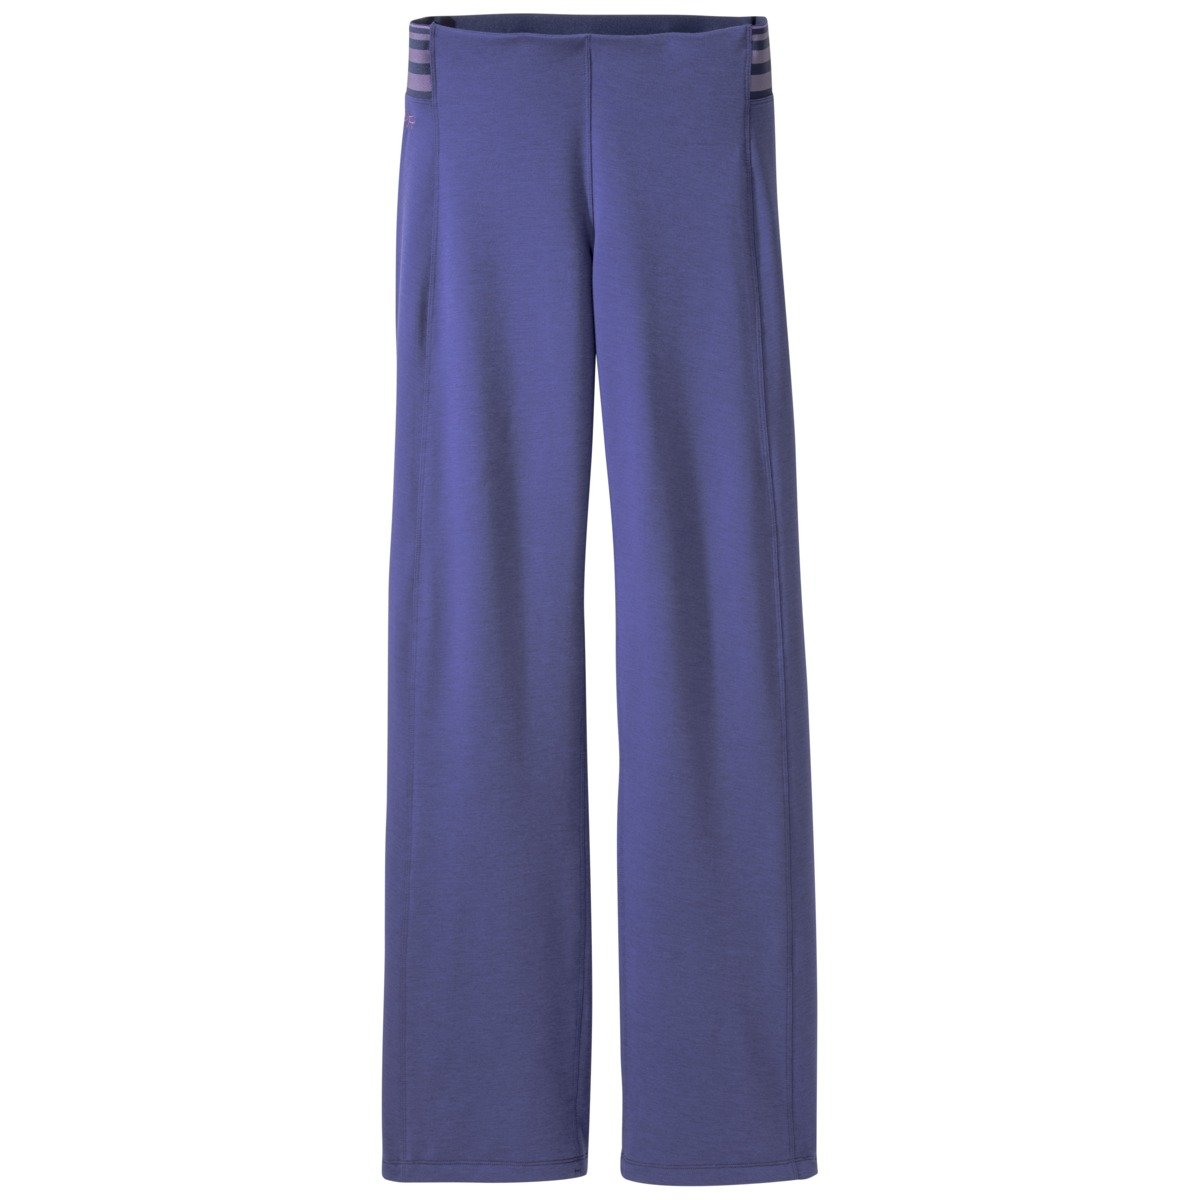 Outdoor Research Piezo Damens's Pants